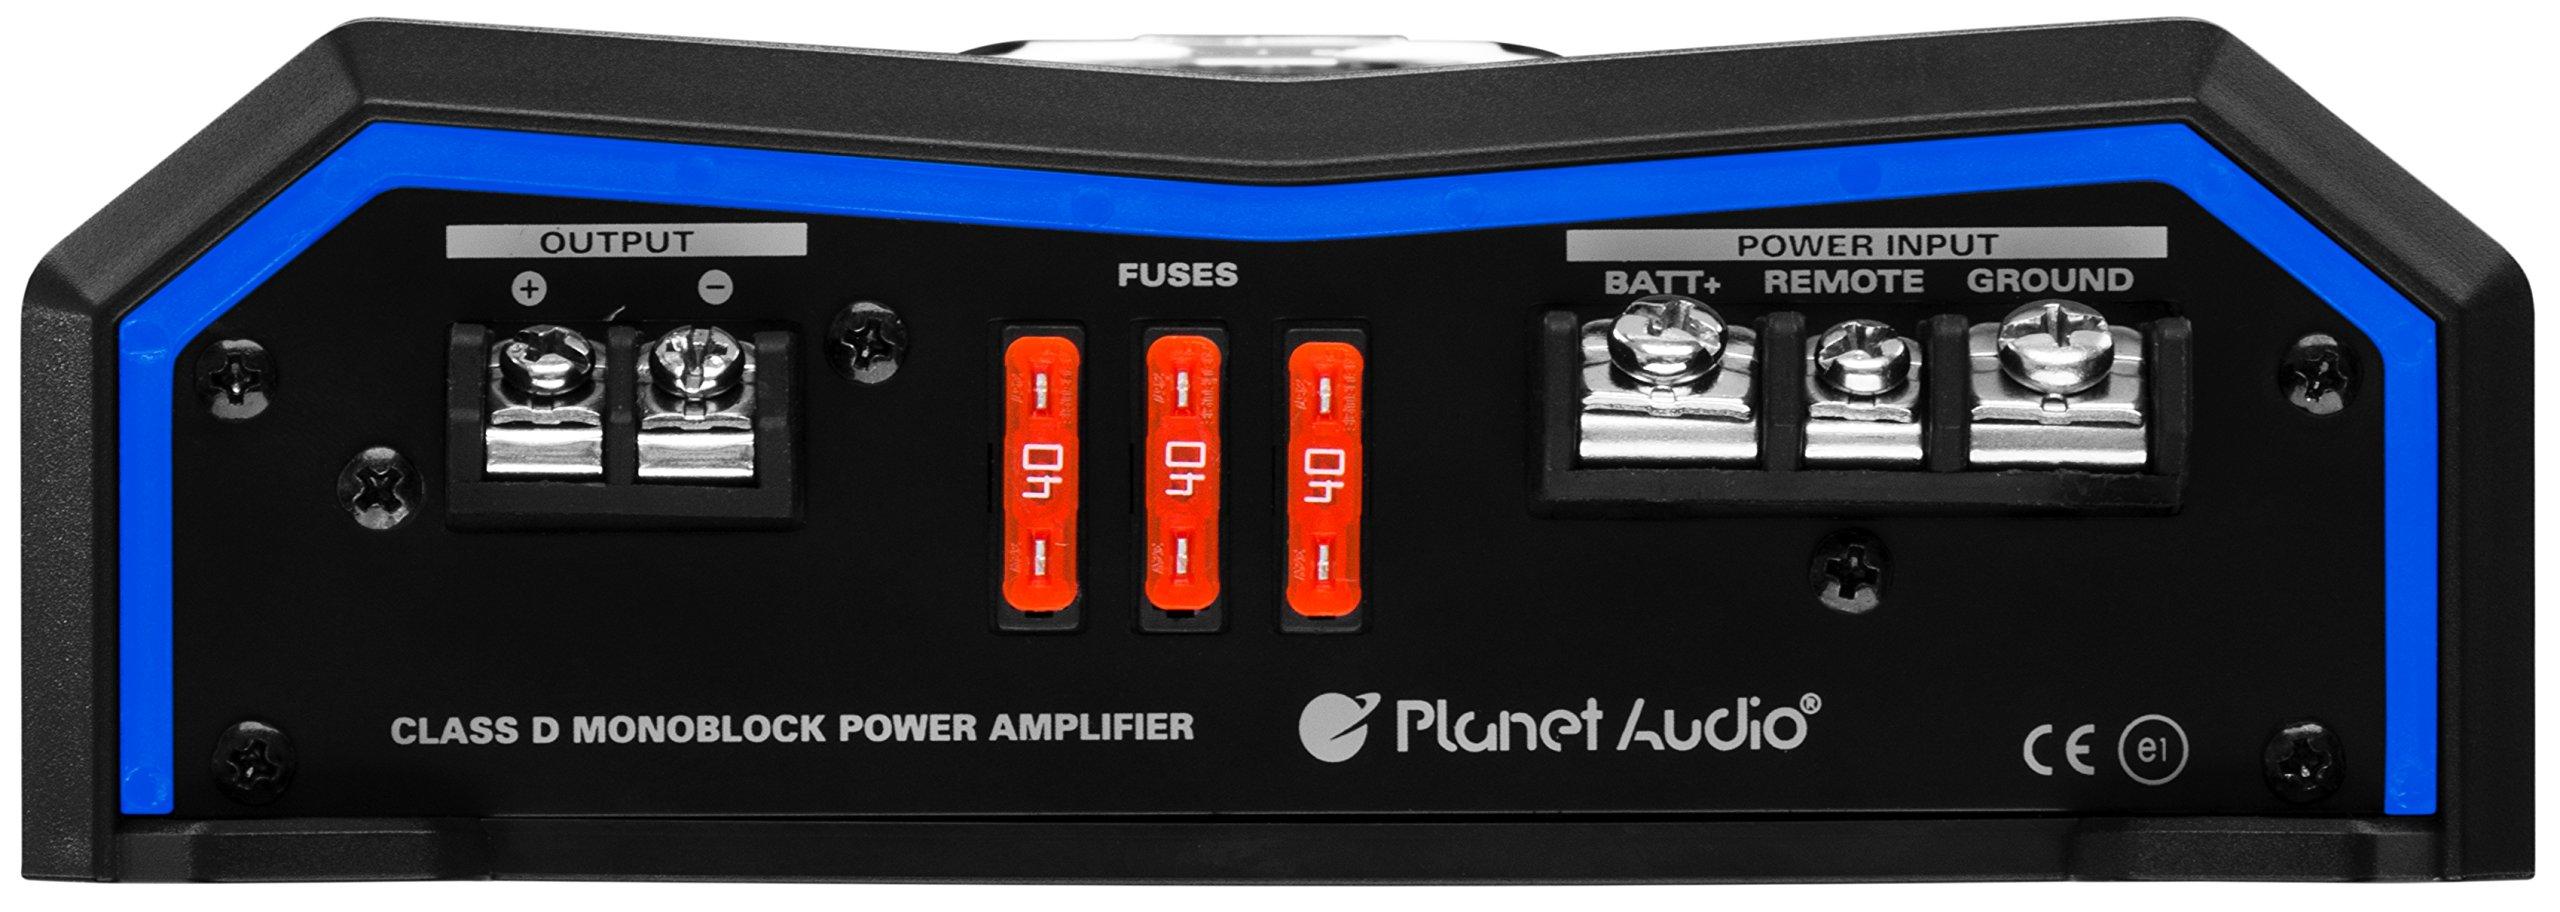 Planet Audio PL4000.1D Pulse 4000 Watt, 1 Ohm Stable Class D Monoblock Car Amplifier with Remote Subwoofer Control by Planet Audio (Image #3)